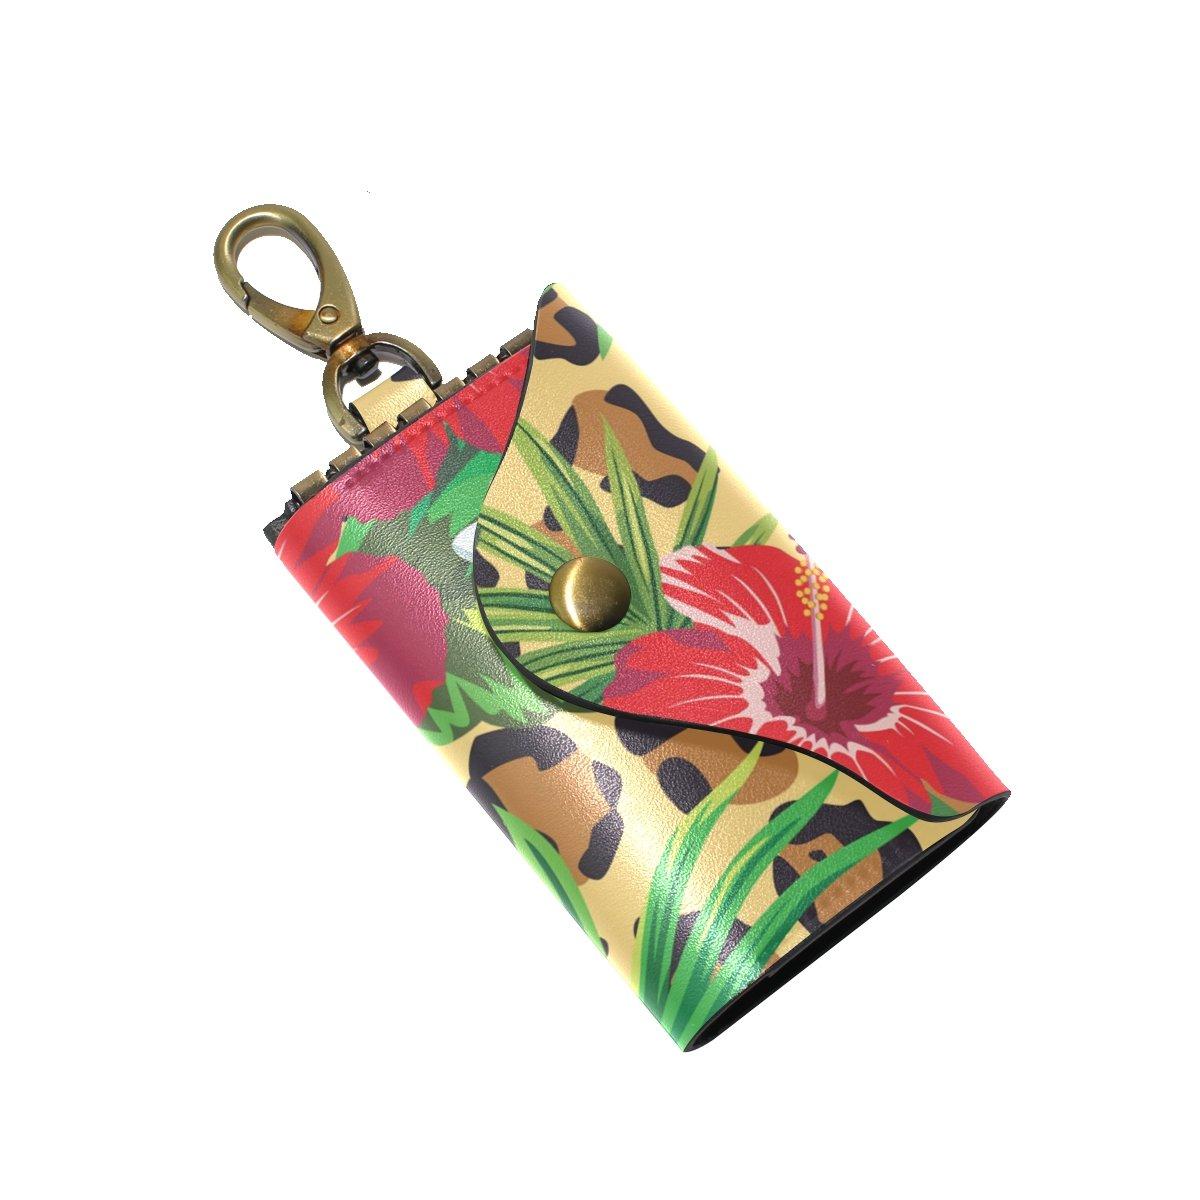 KEAKIA Leopard Leather Key Case Wallets Tri-fold Key Holder Keychains with 6 Hooks 2 Slot Snap Closure for Men Women